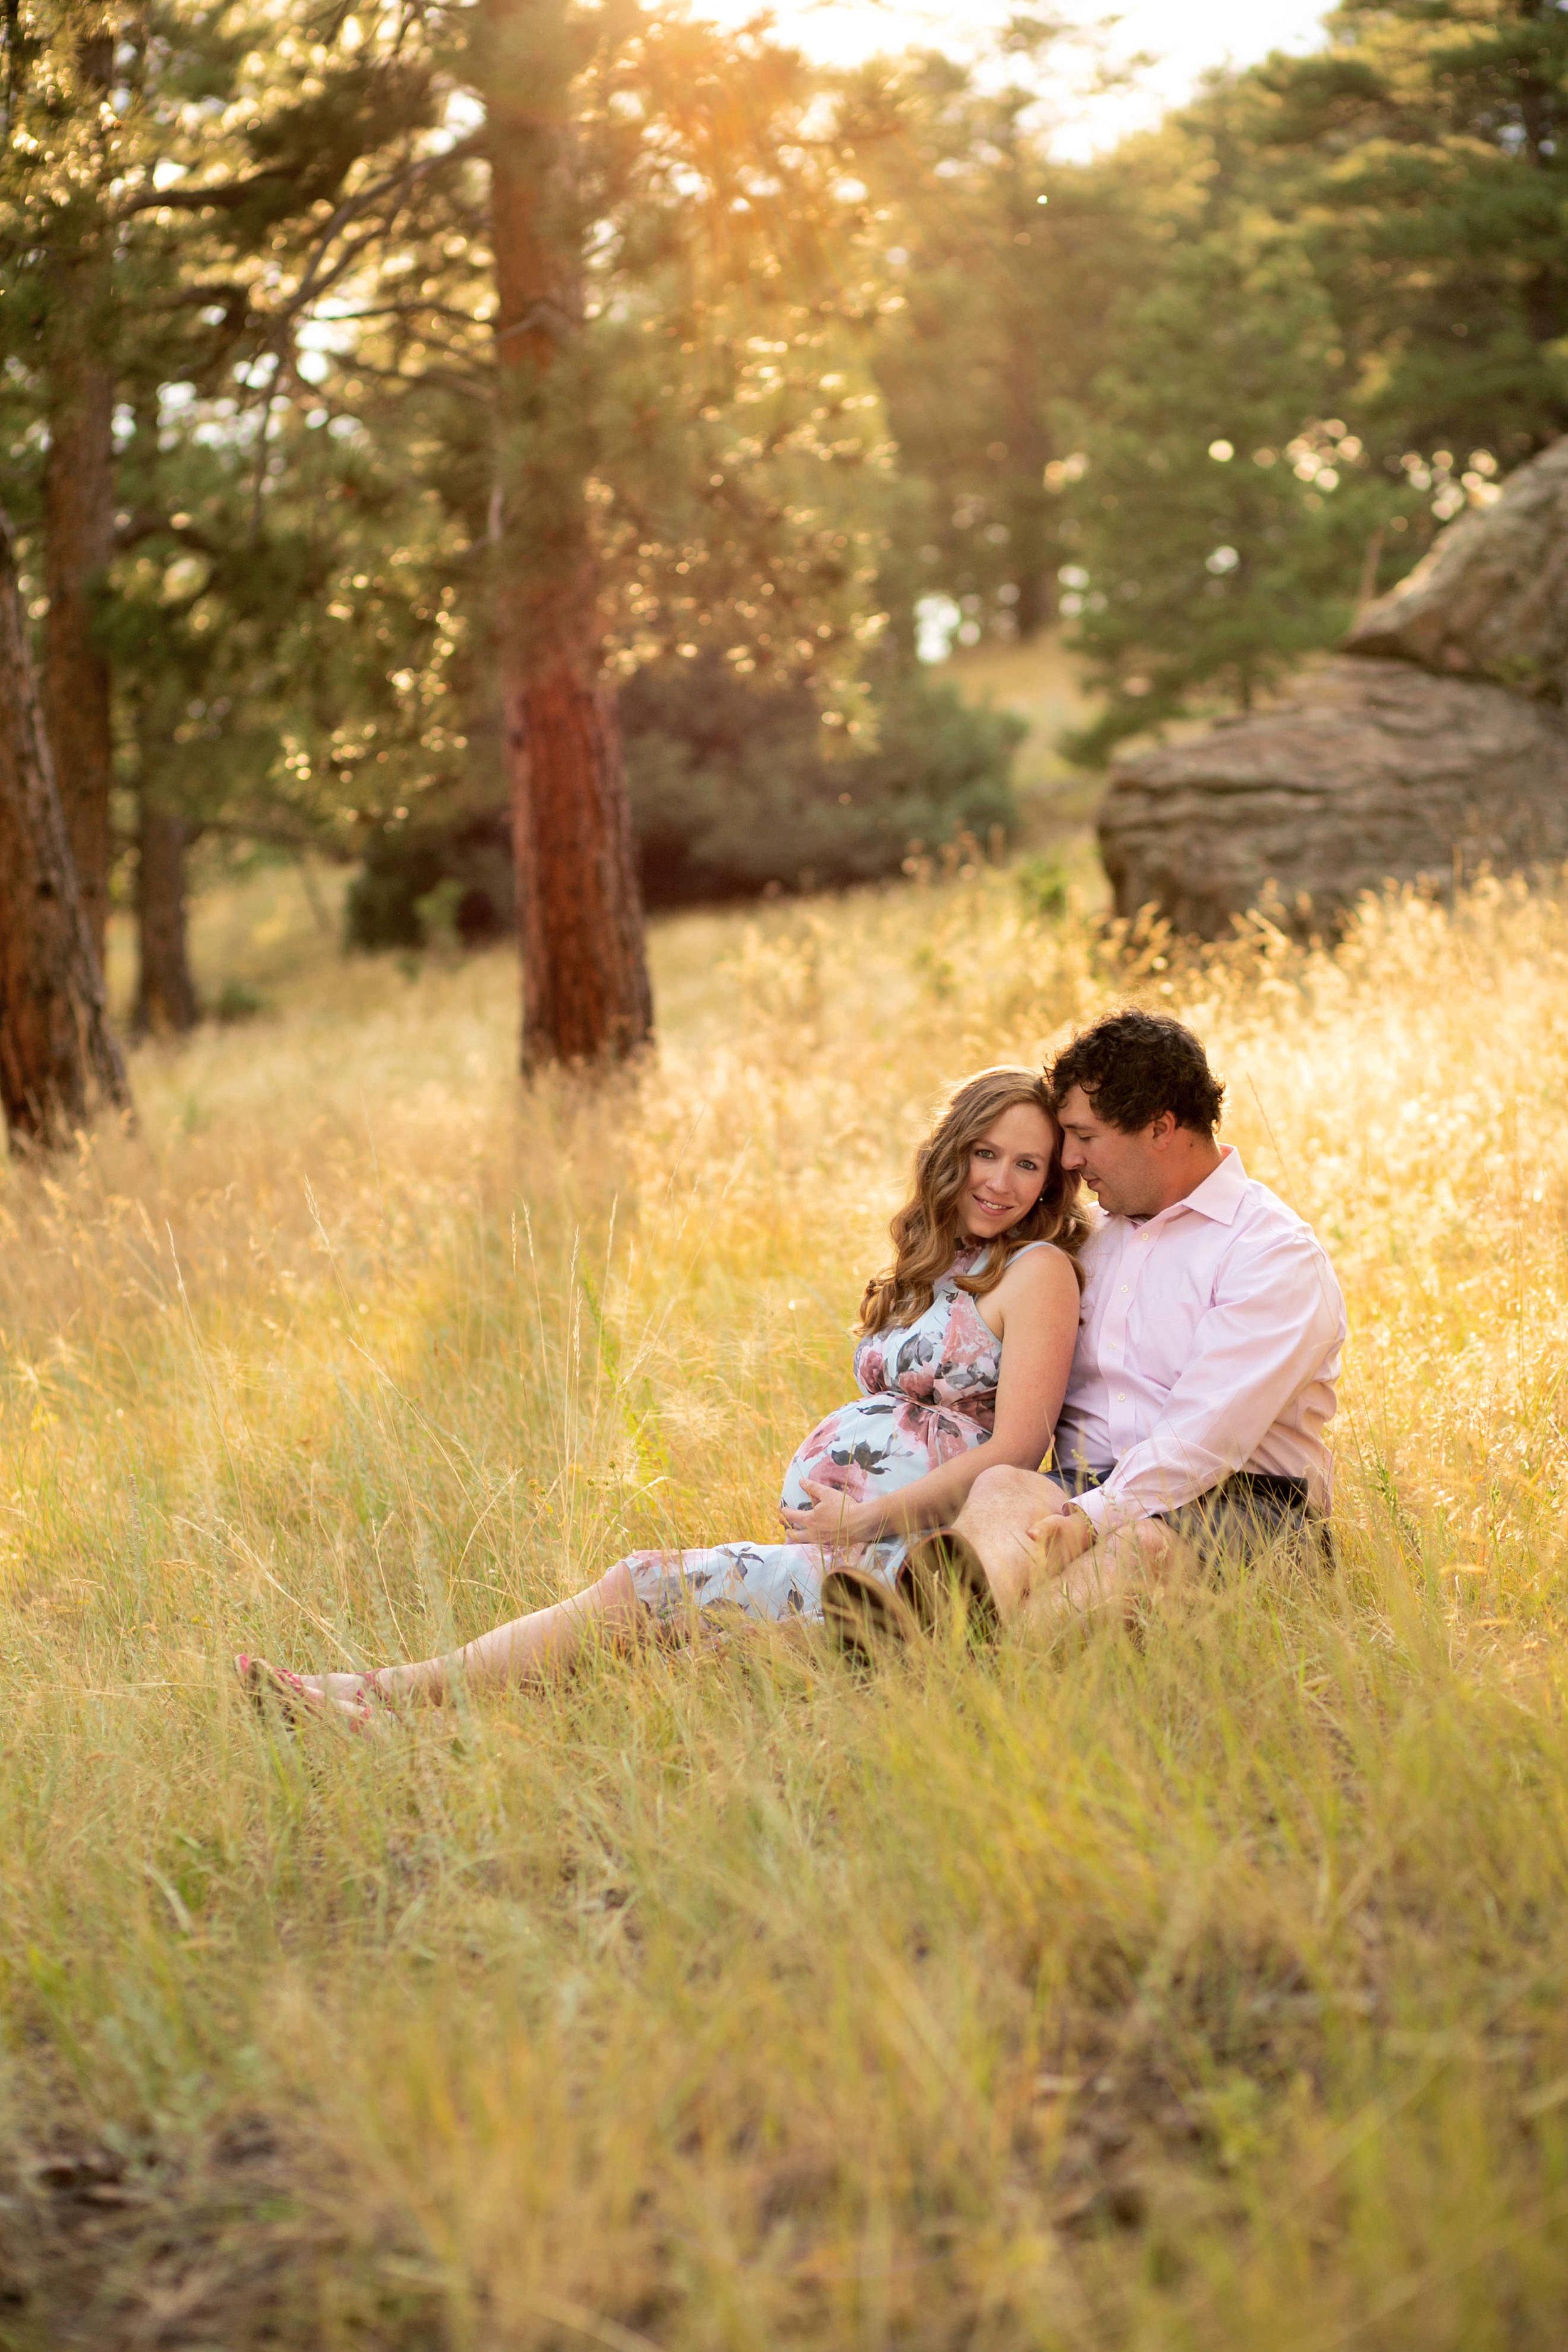 Denver Maternity Photographer Denver newborn photographer Boulder Newborn Photographer Boulder Maternity Photographer